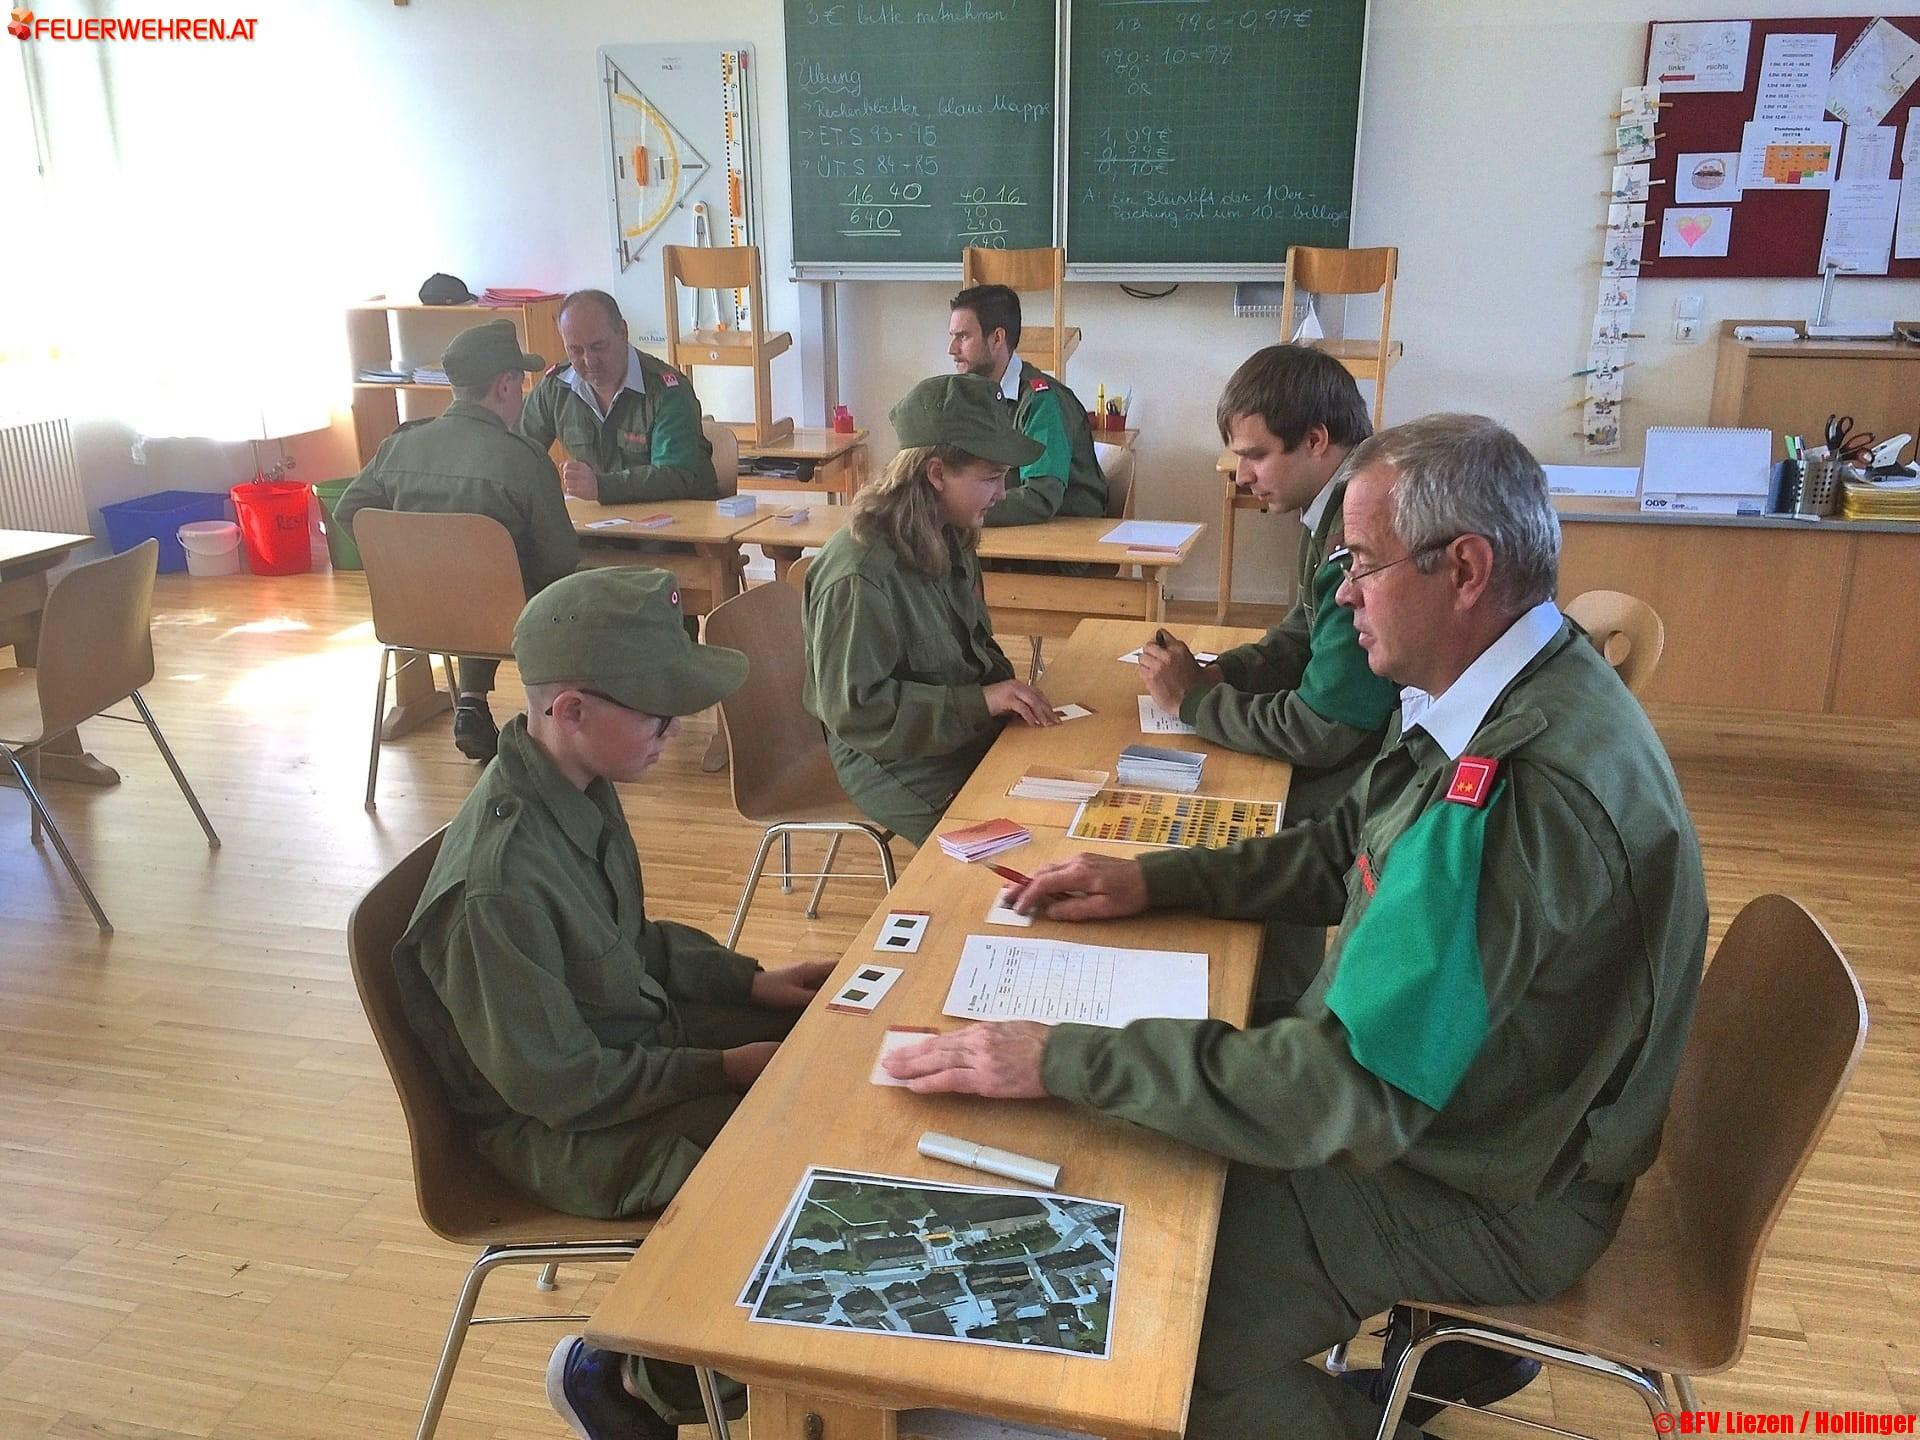 BFV Liezen / Hollinger